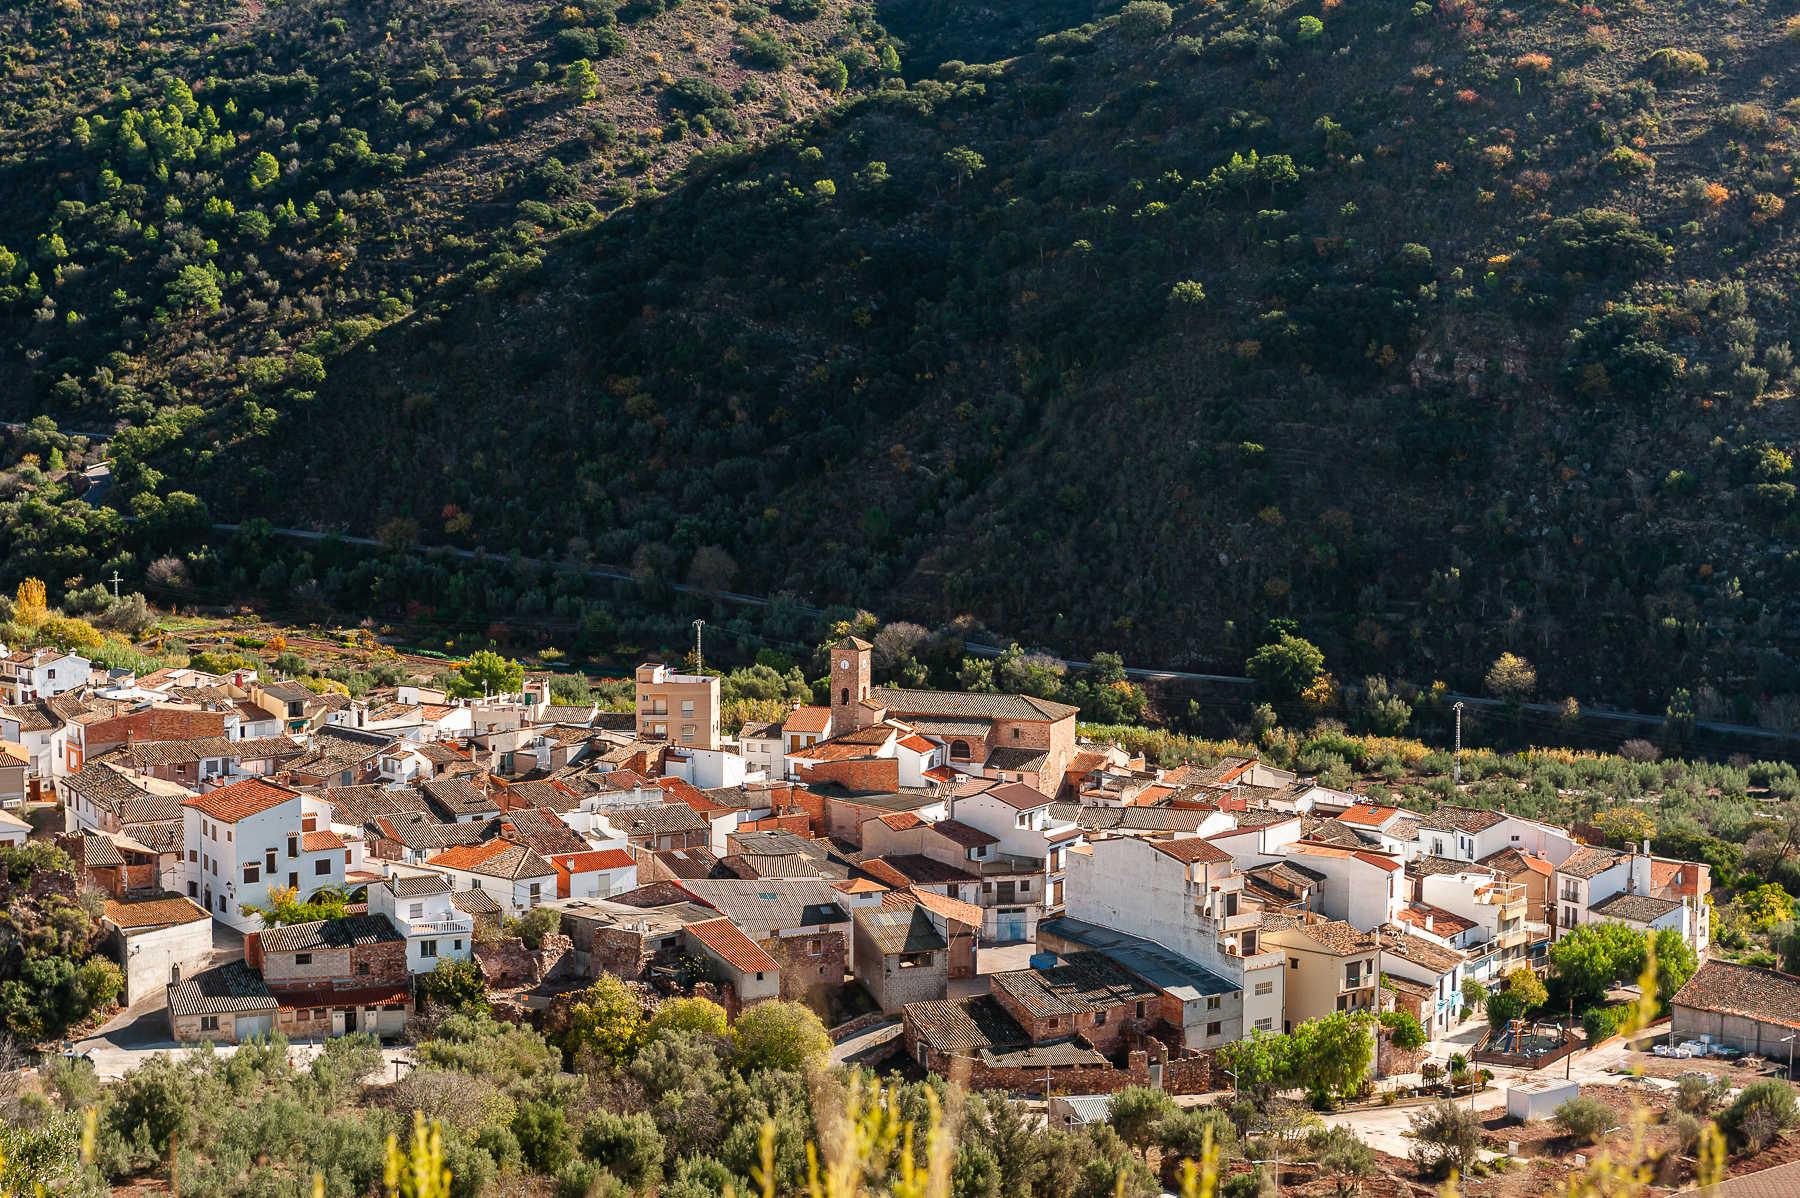 https://multimedia.comunitatvalenciana.com/52C505CC525544D59D0EEB2CB246FFCB/img/C9399F9E84114C93A99E6643F0EB1D97/2027-Almedijar-Pueblo-0080.jpg?responsive